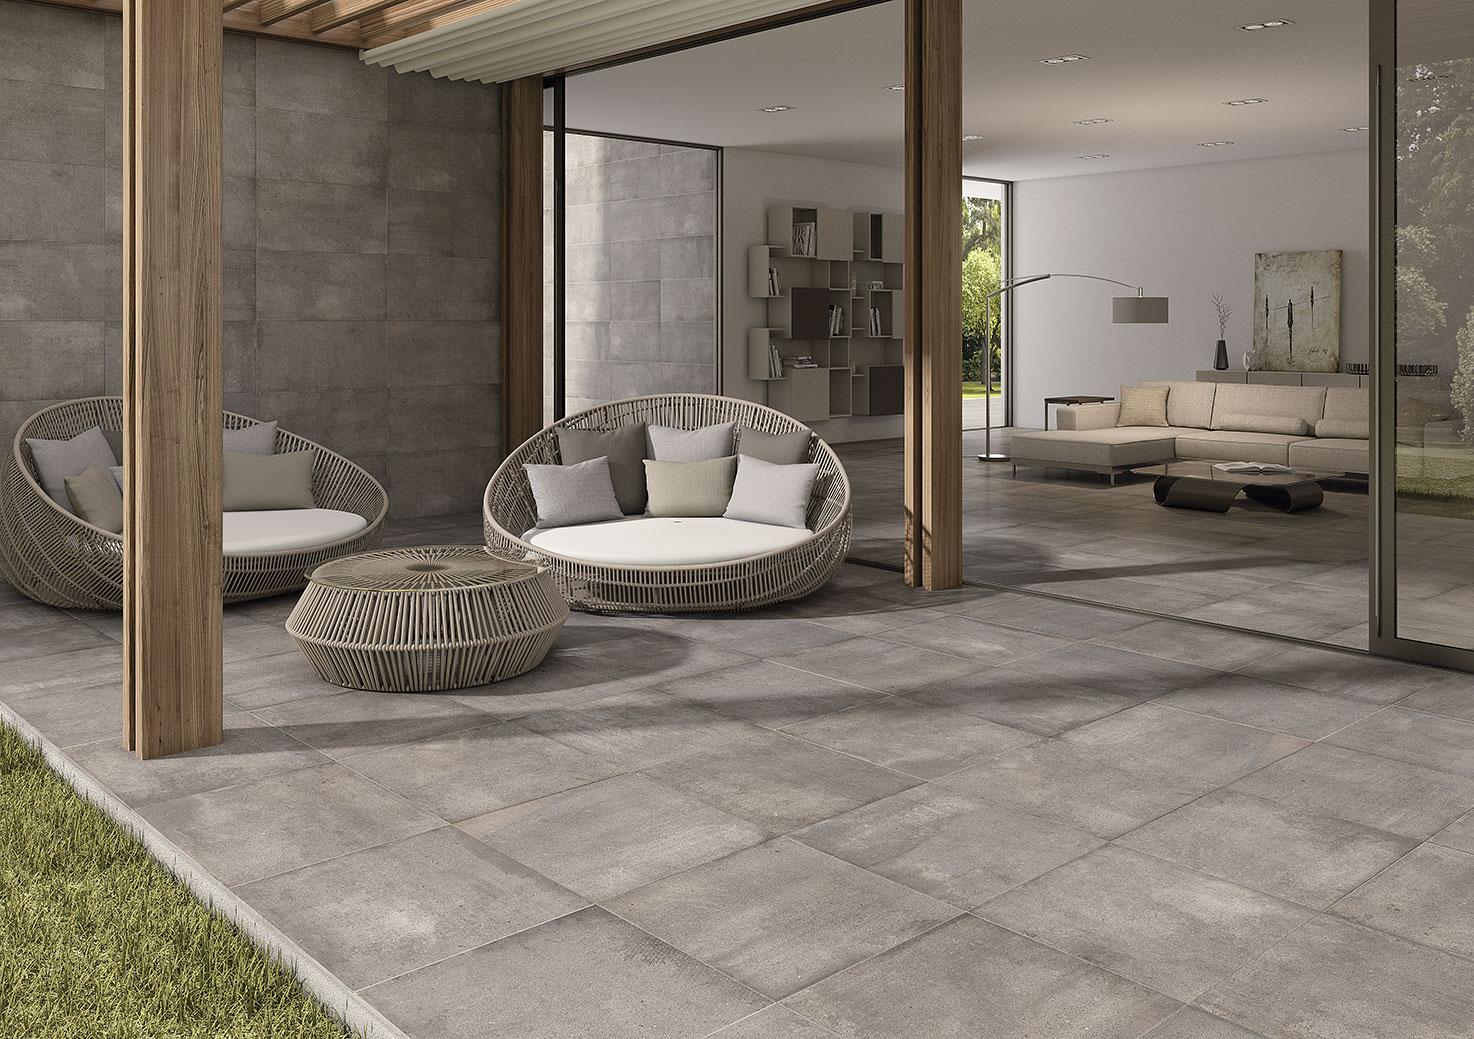 Sicilia bellacasa cer mica for Bella casa tiles